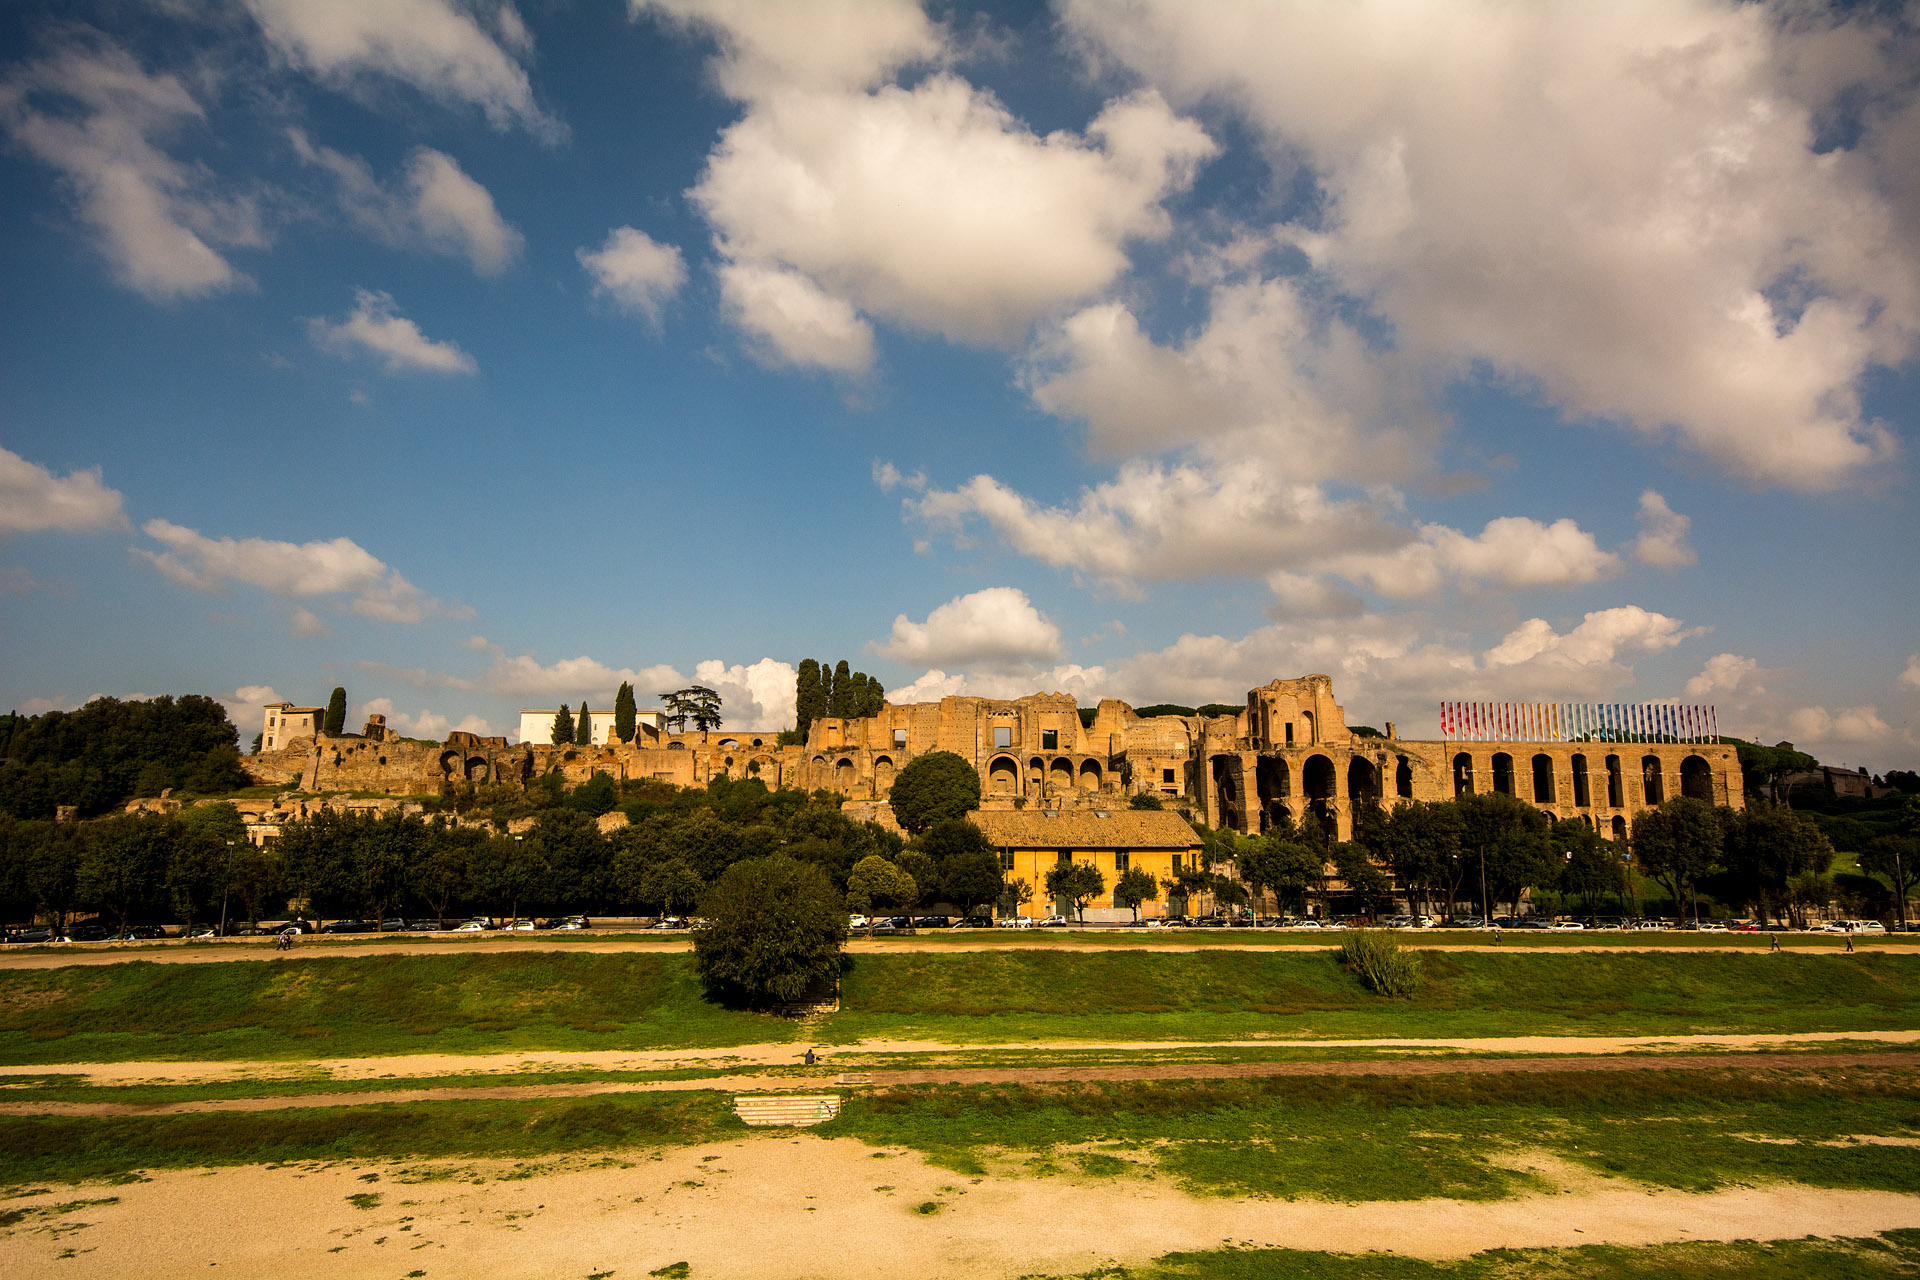 Flavian Palace & Circus Maximus